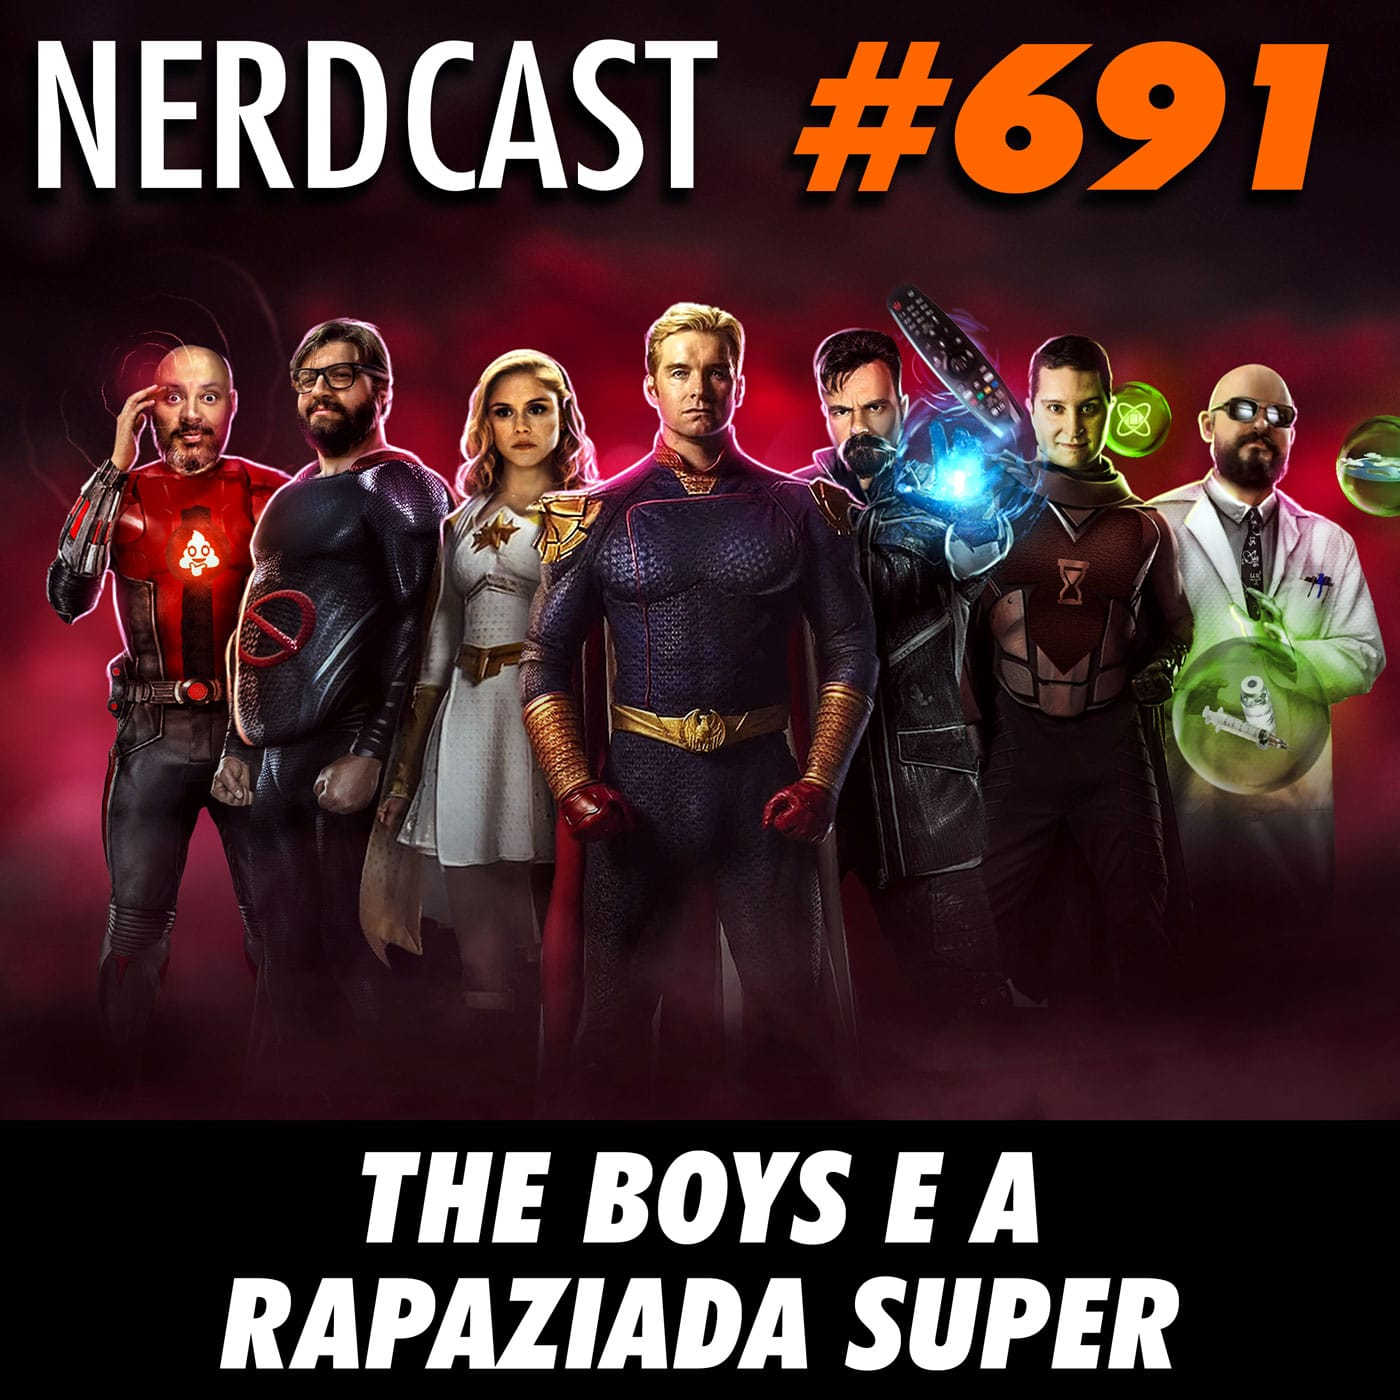 NerdCast 691 - The Boys e a rapaziada super